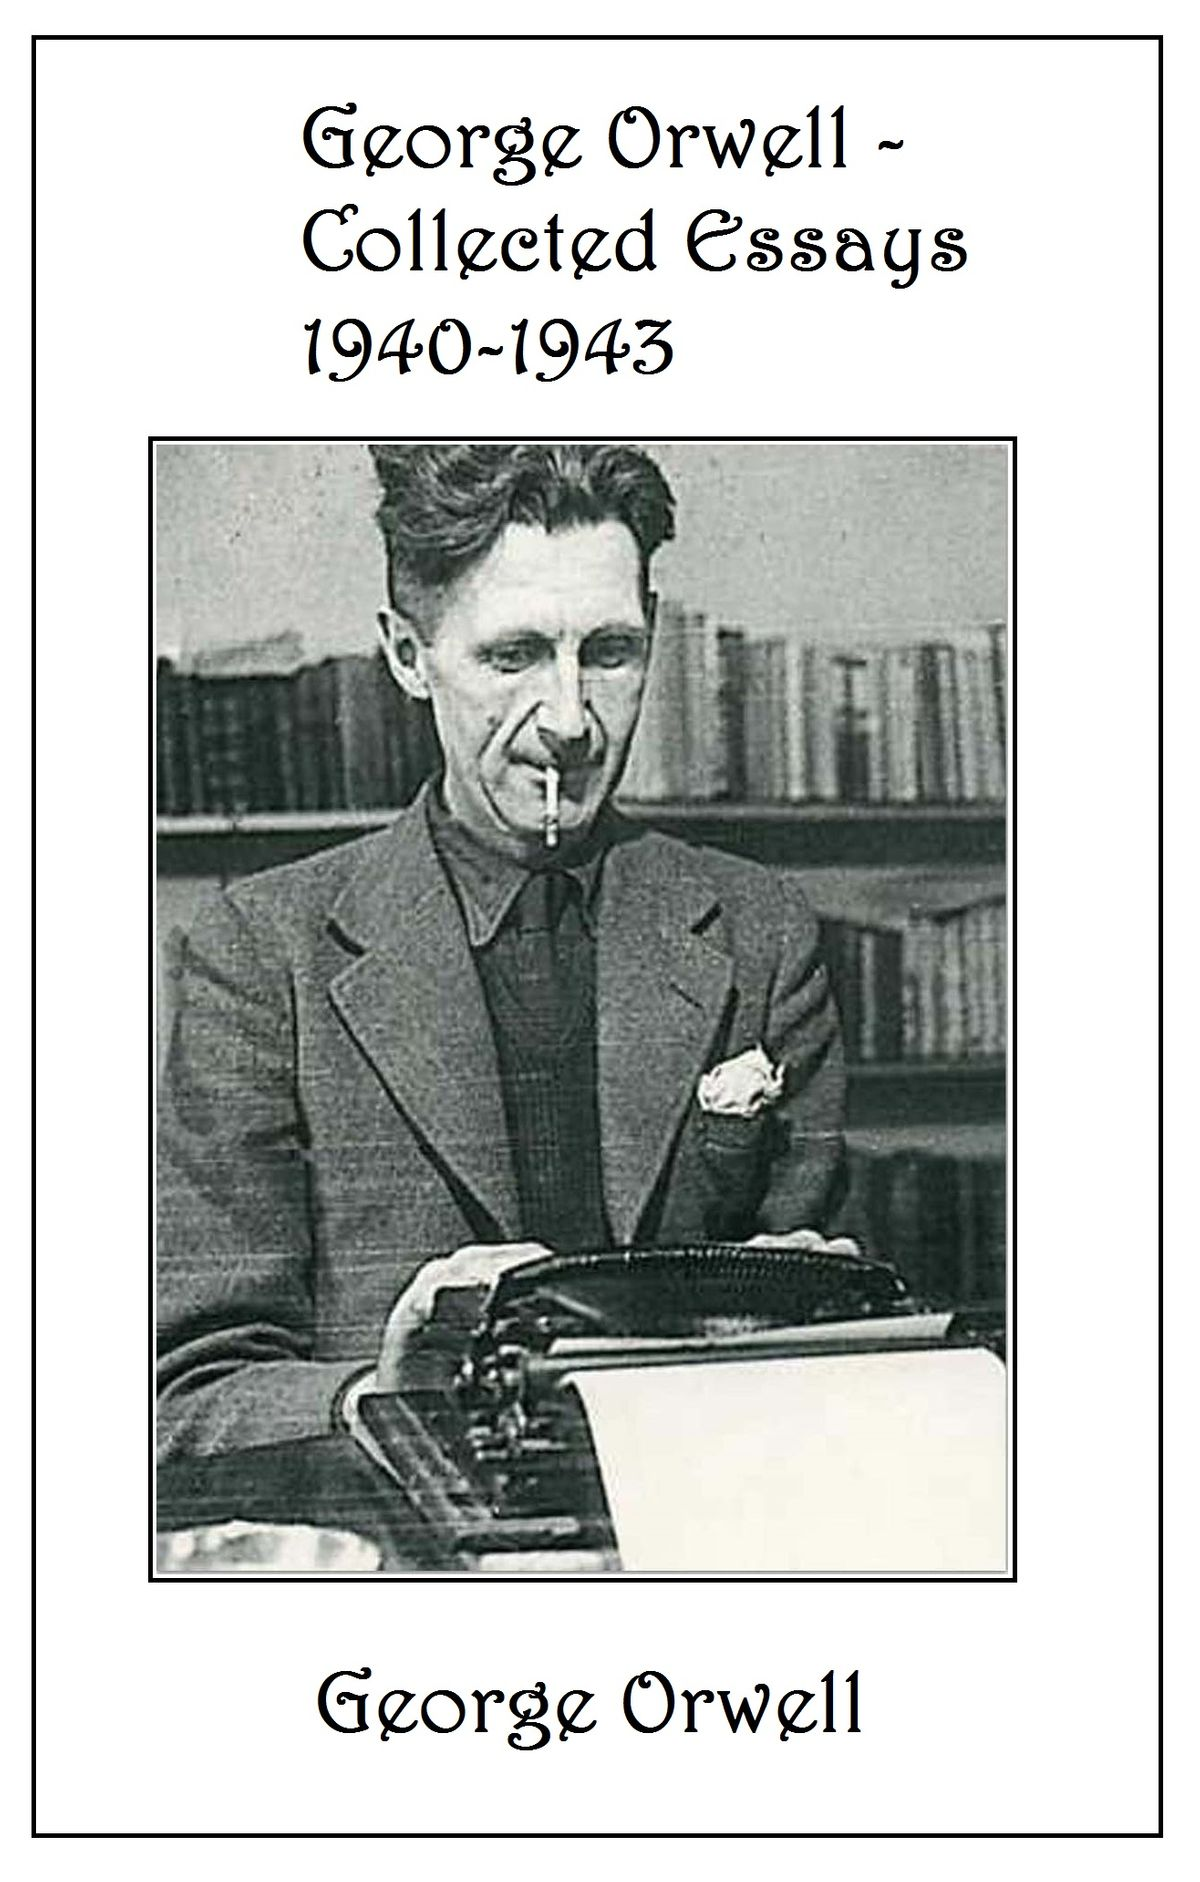 002 George Orwell Collected Essays Essay Frightening Everyman's Library Summary Bookshop Memories Full